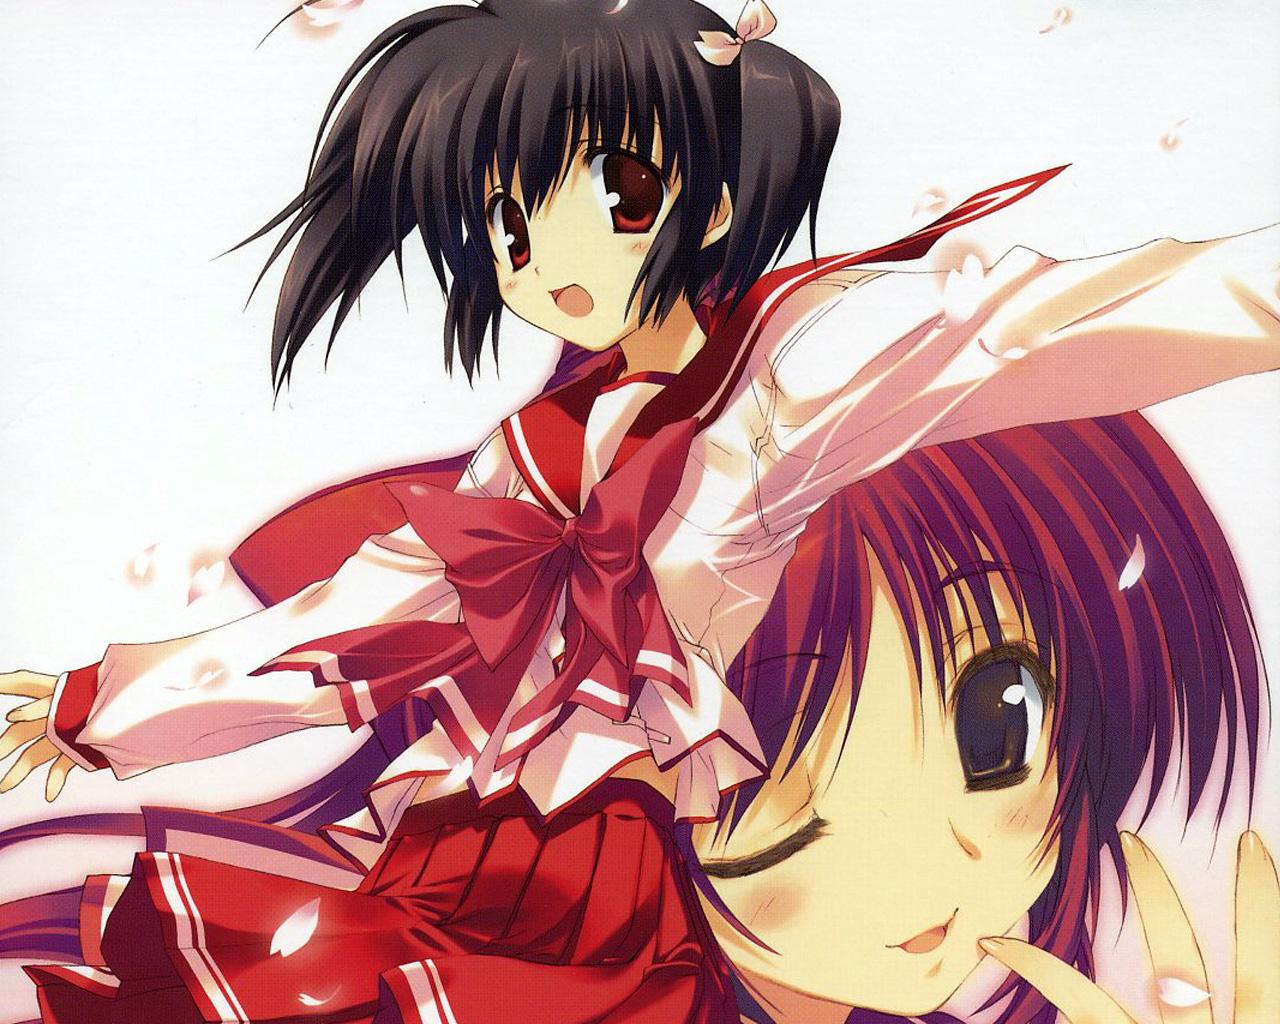 amaduyu_tatsuki aquaplus kousaka_tamaki leaf mitsumi_misato to_heart to_heart_2 yuzuhara_konomi